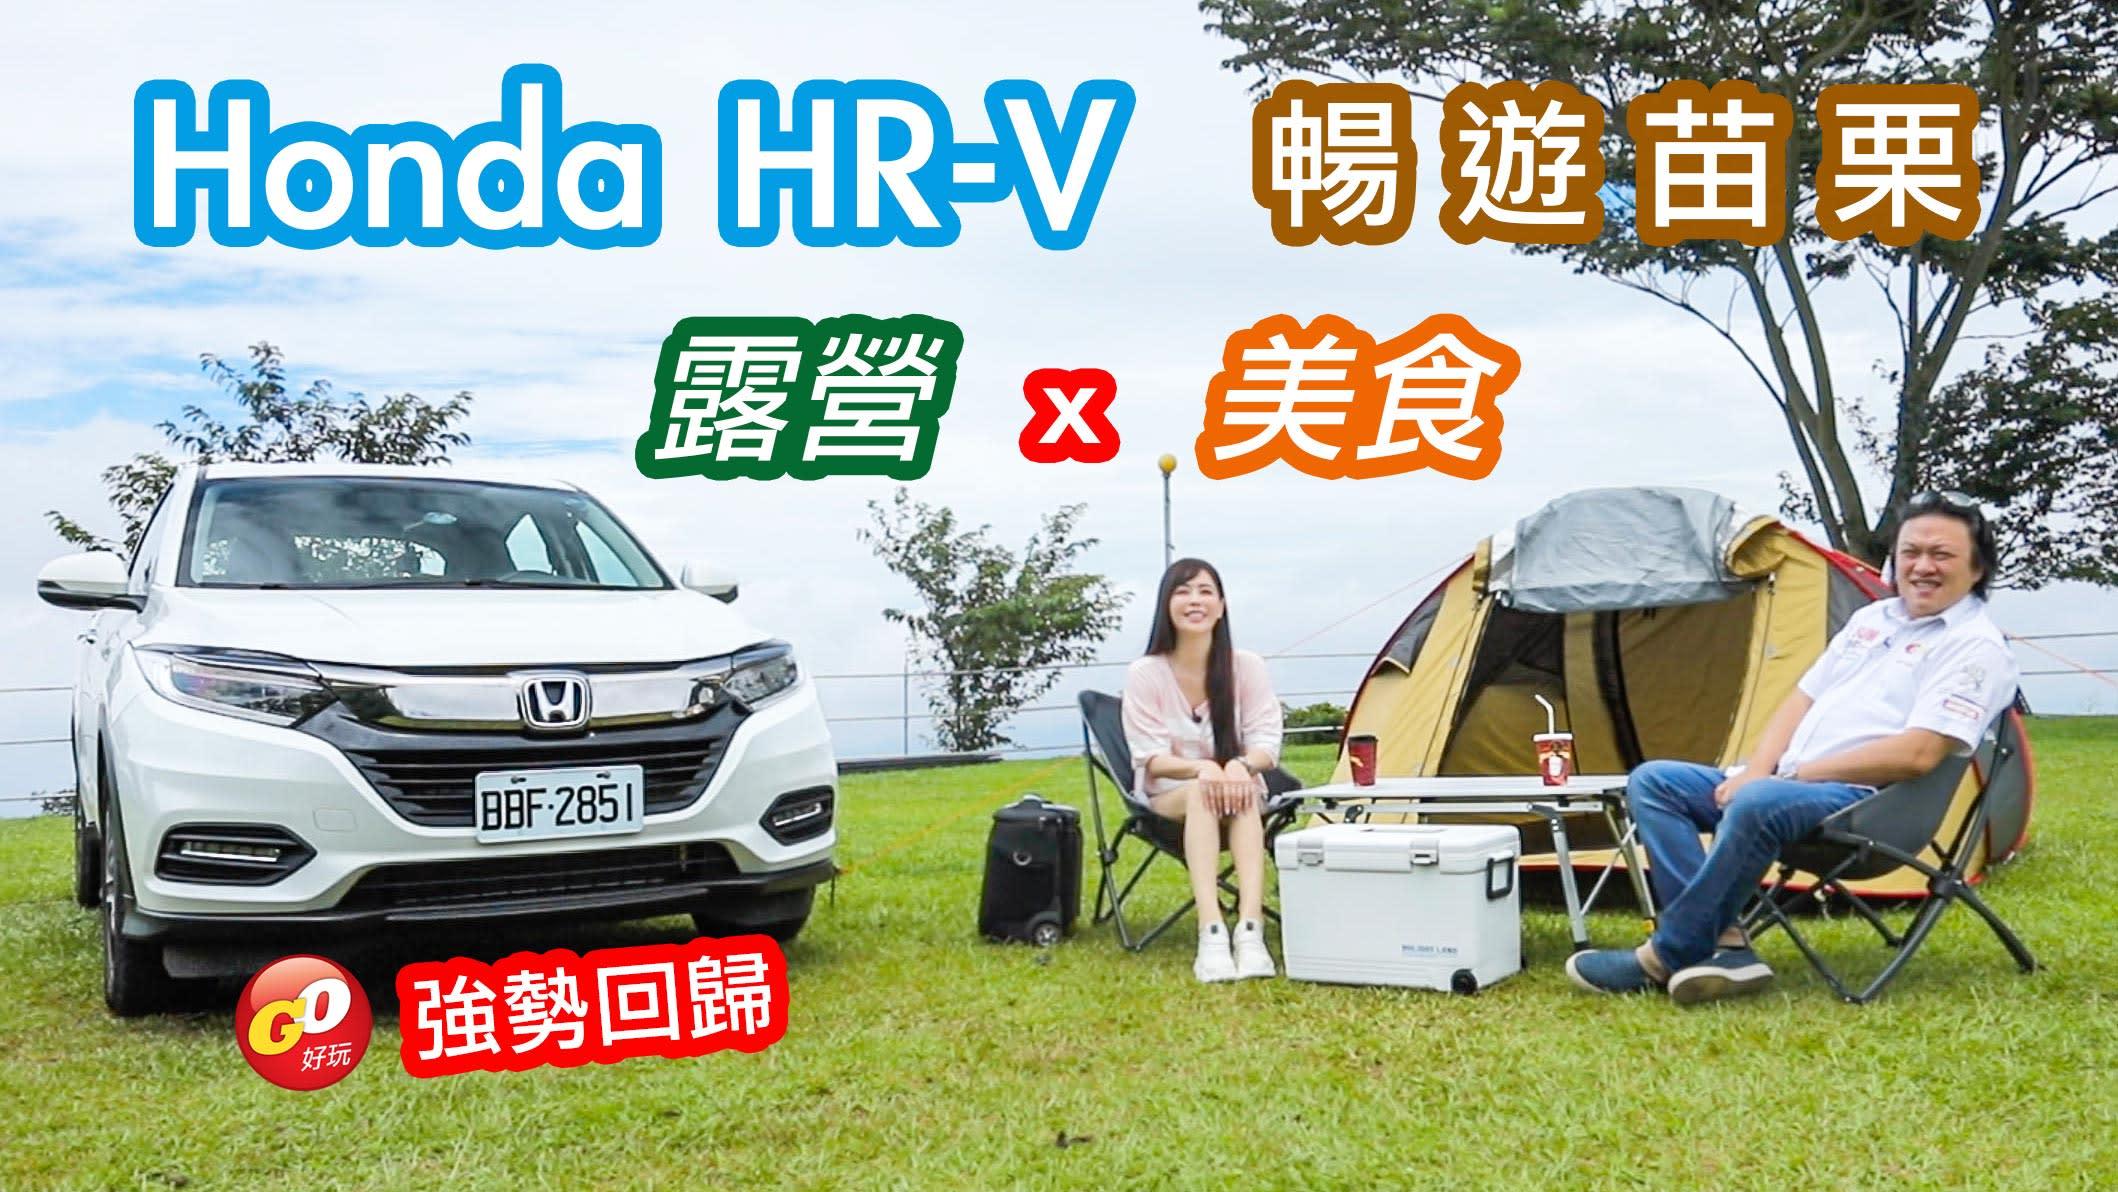 【Go好玩】嘉偉、冠儀體驗菜鳥露營、大啖美食!Honda HR-V遊苗栗